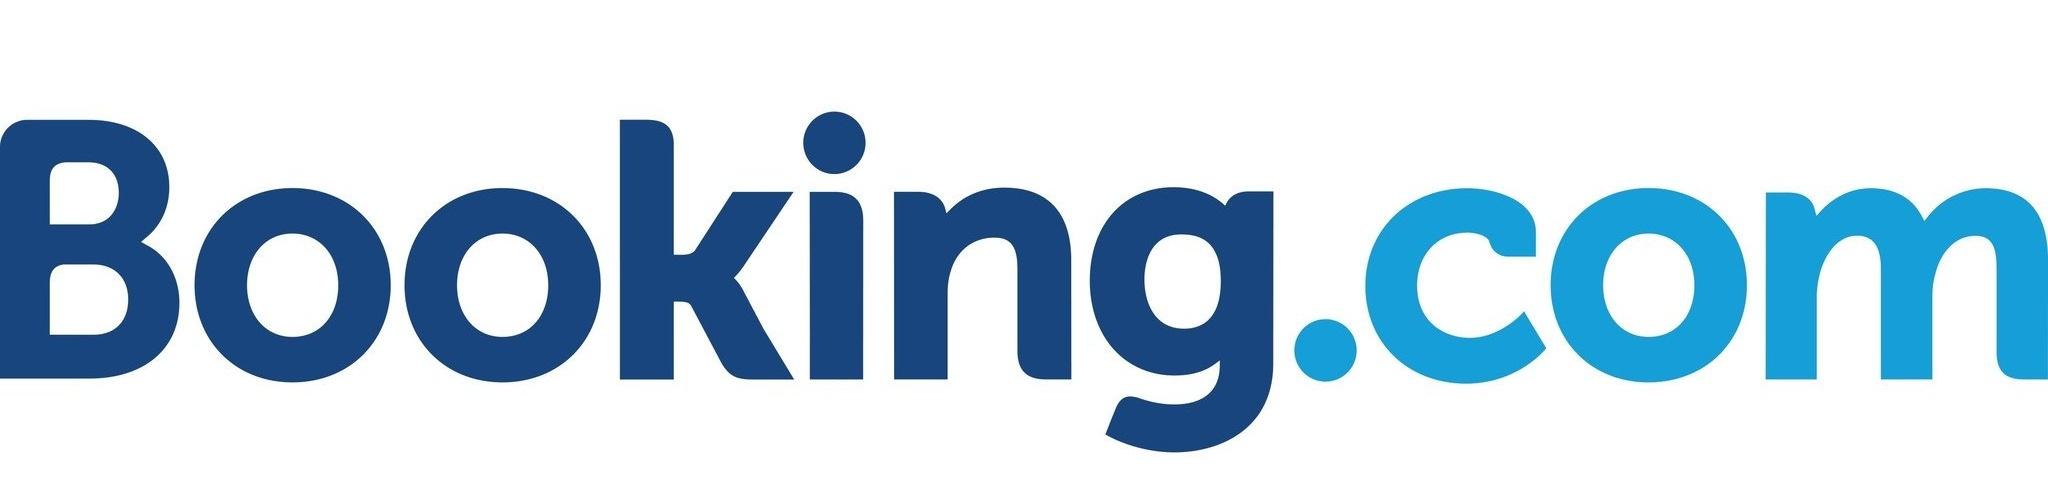 booking.com-552487-edited